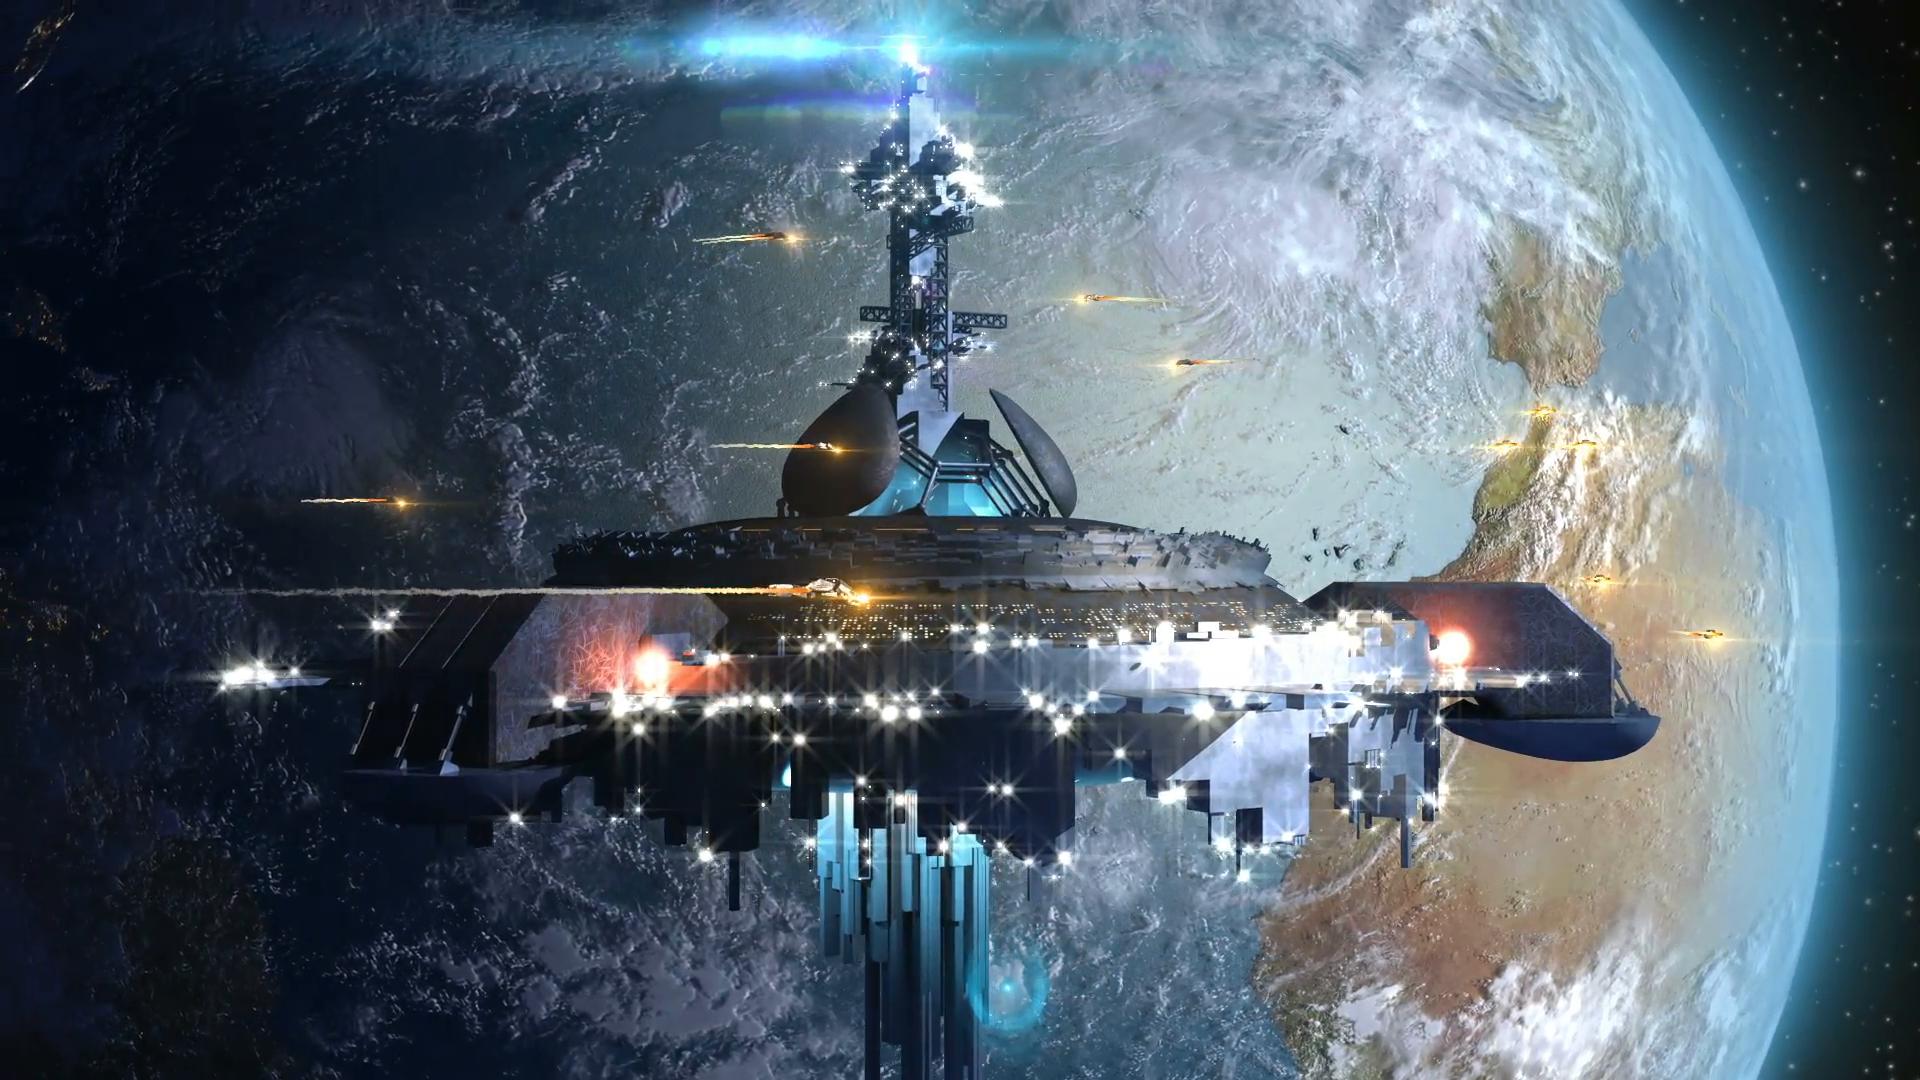 Alien mothership near Earth, for futuristic, fantasy or interstellar ...